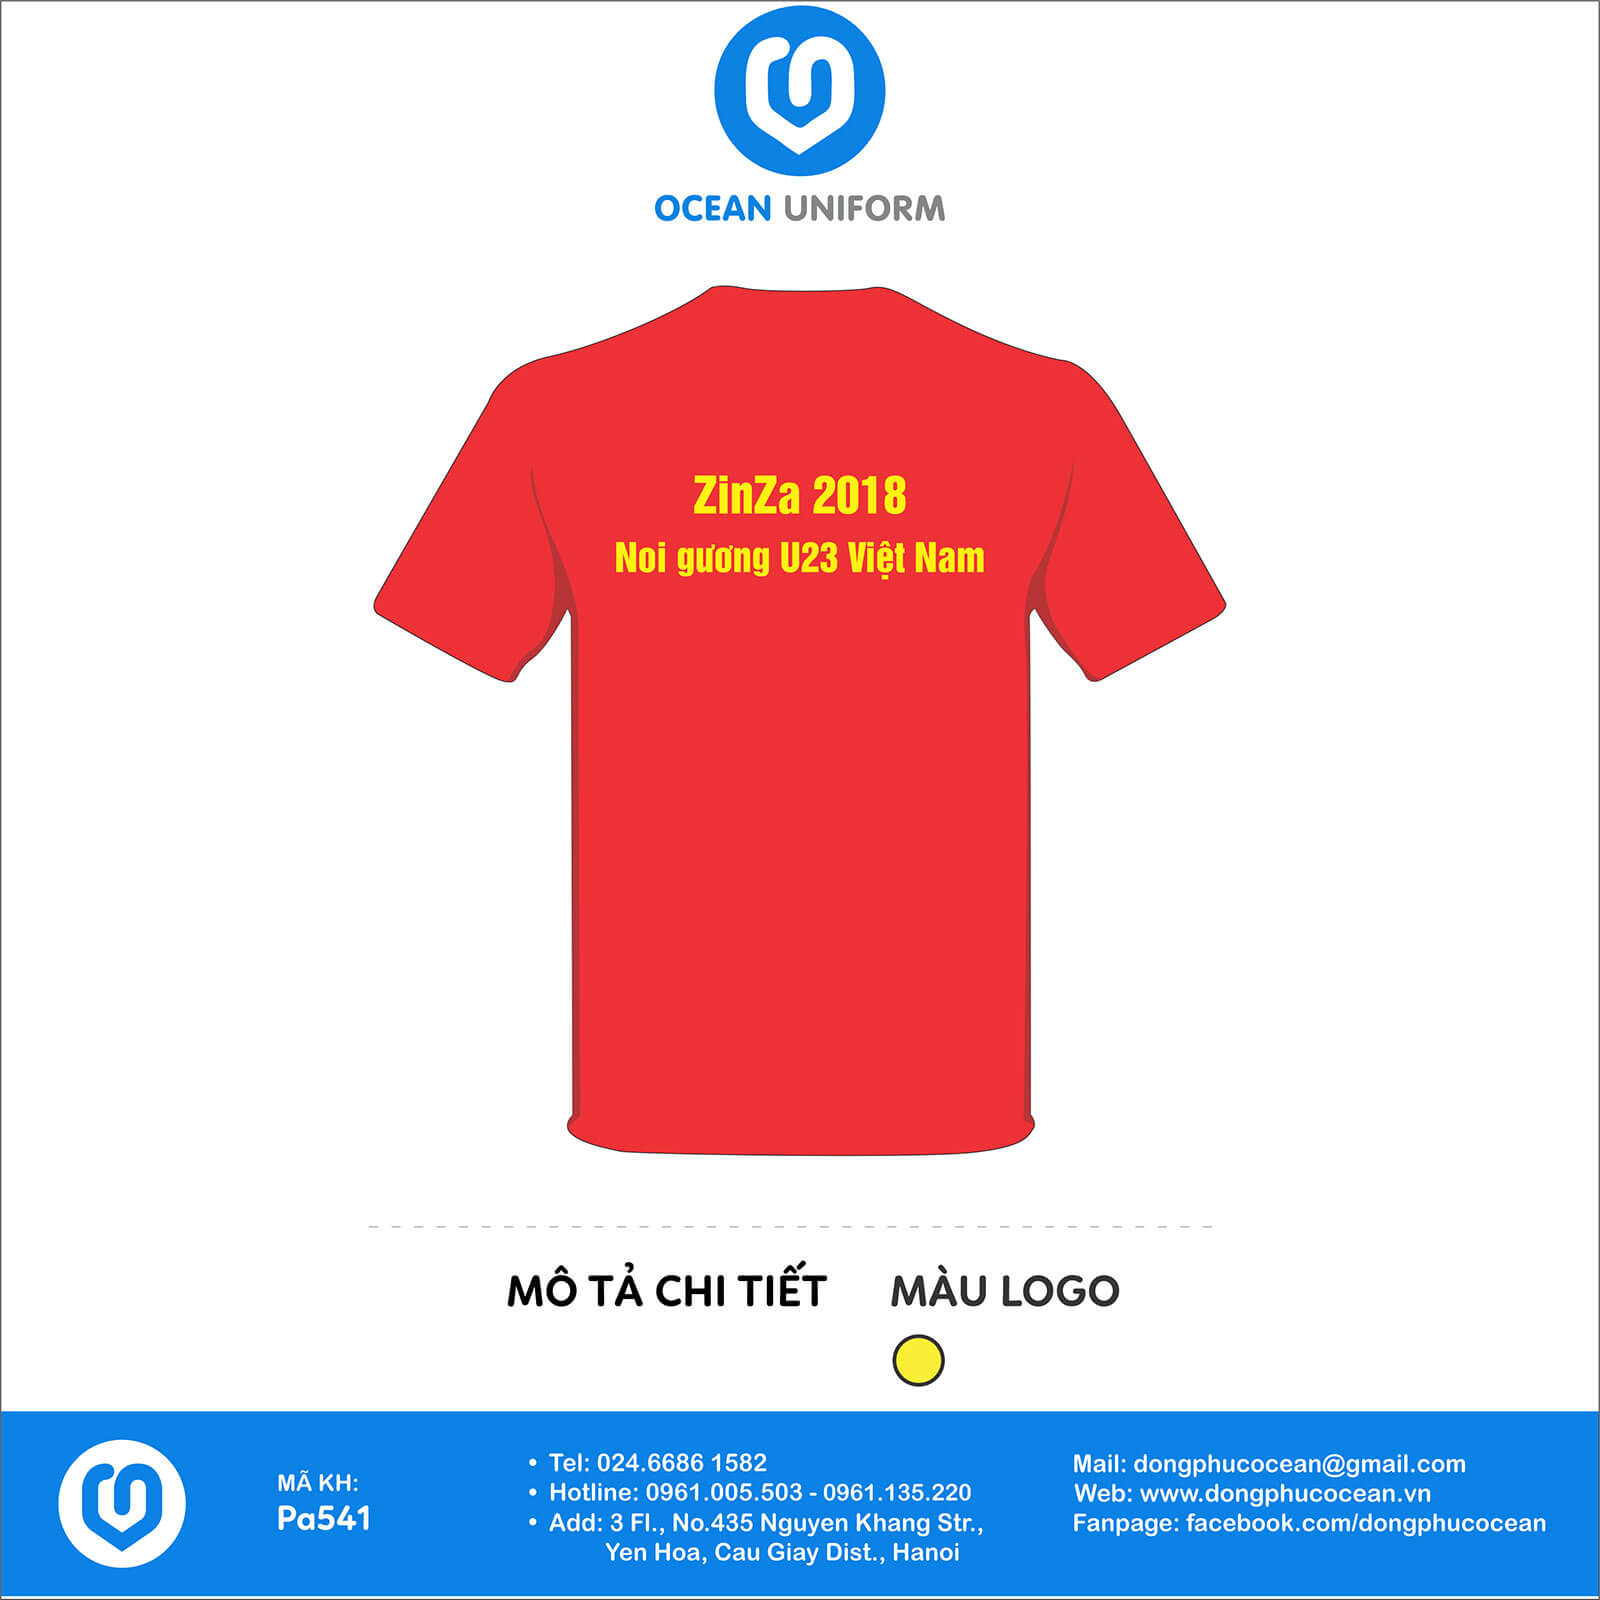 Áo cờ đỏ sao vàng ZinZa 2018mặt sau